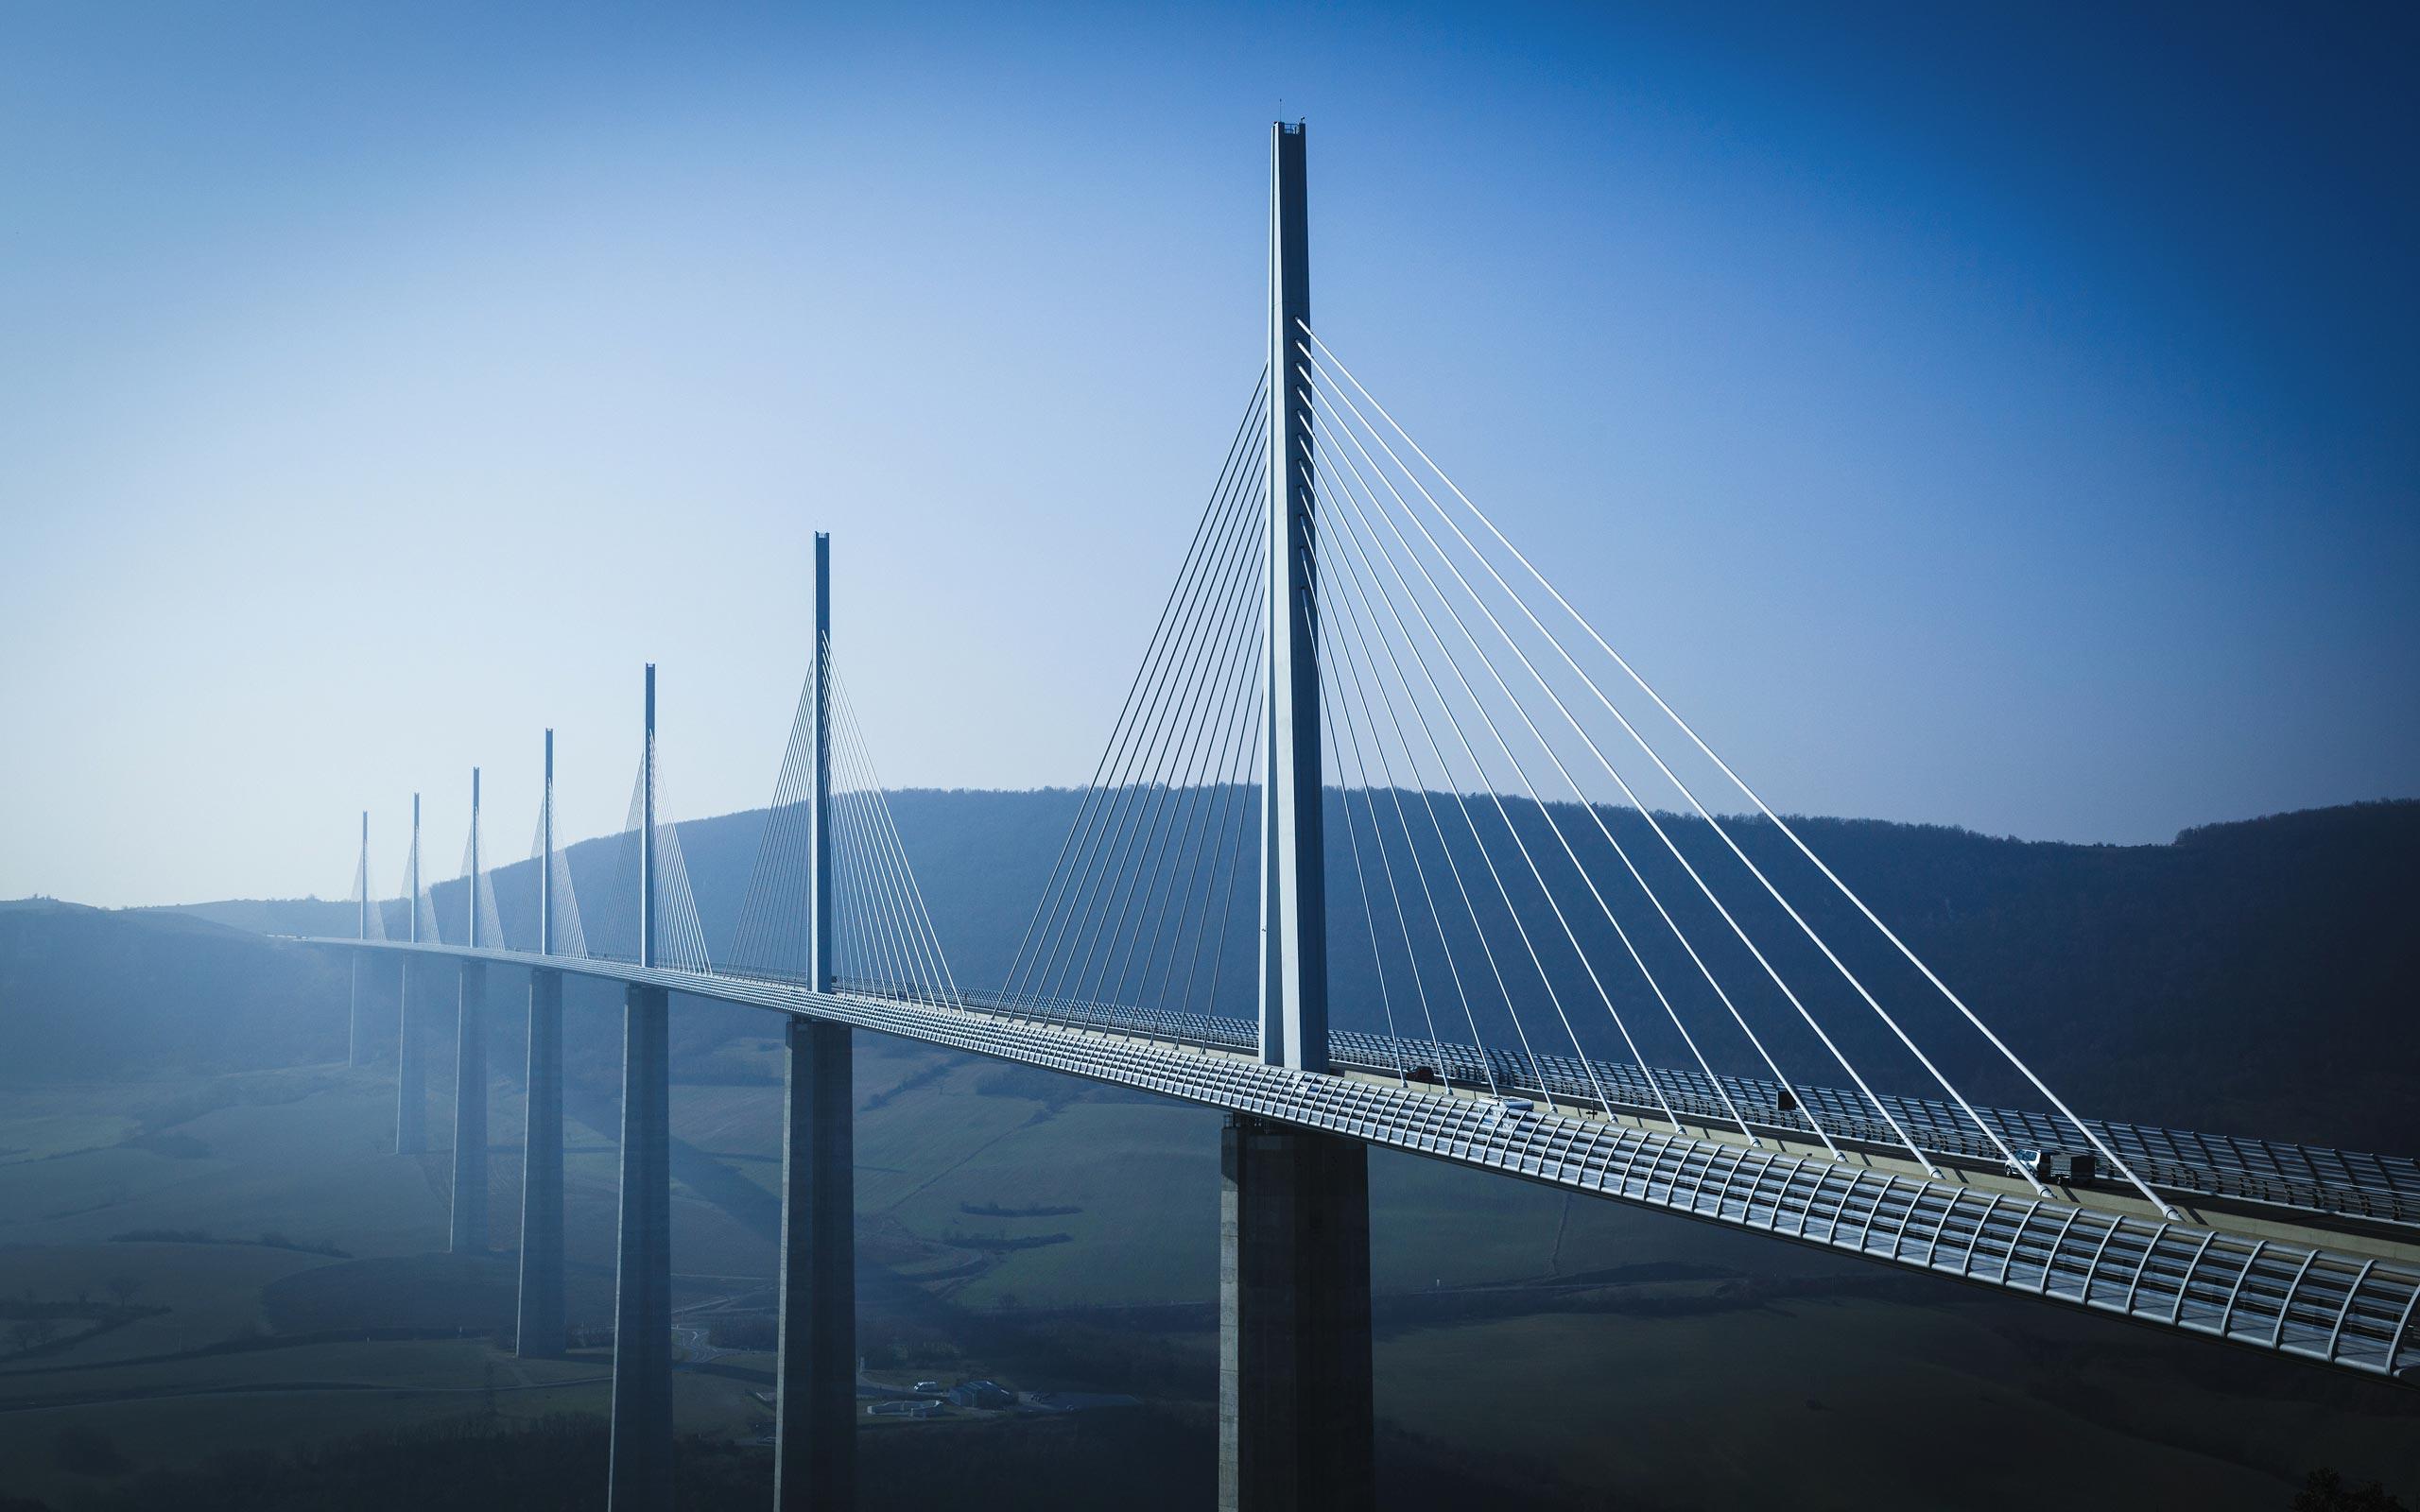 Millau Viaduct Wallpaper 36563 2560x1600 px ~ HDWallSource.com